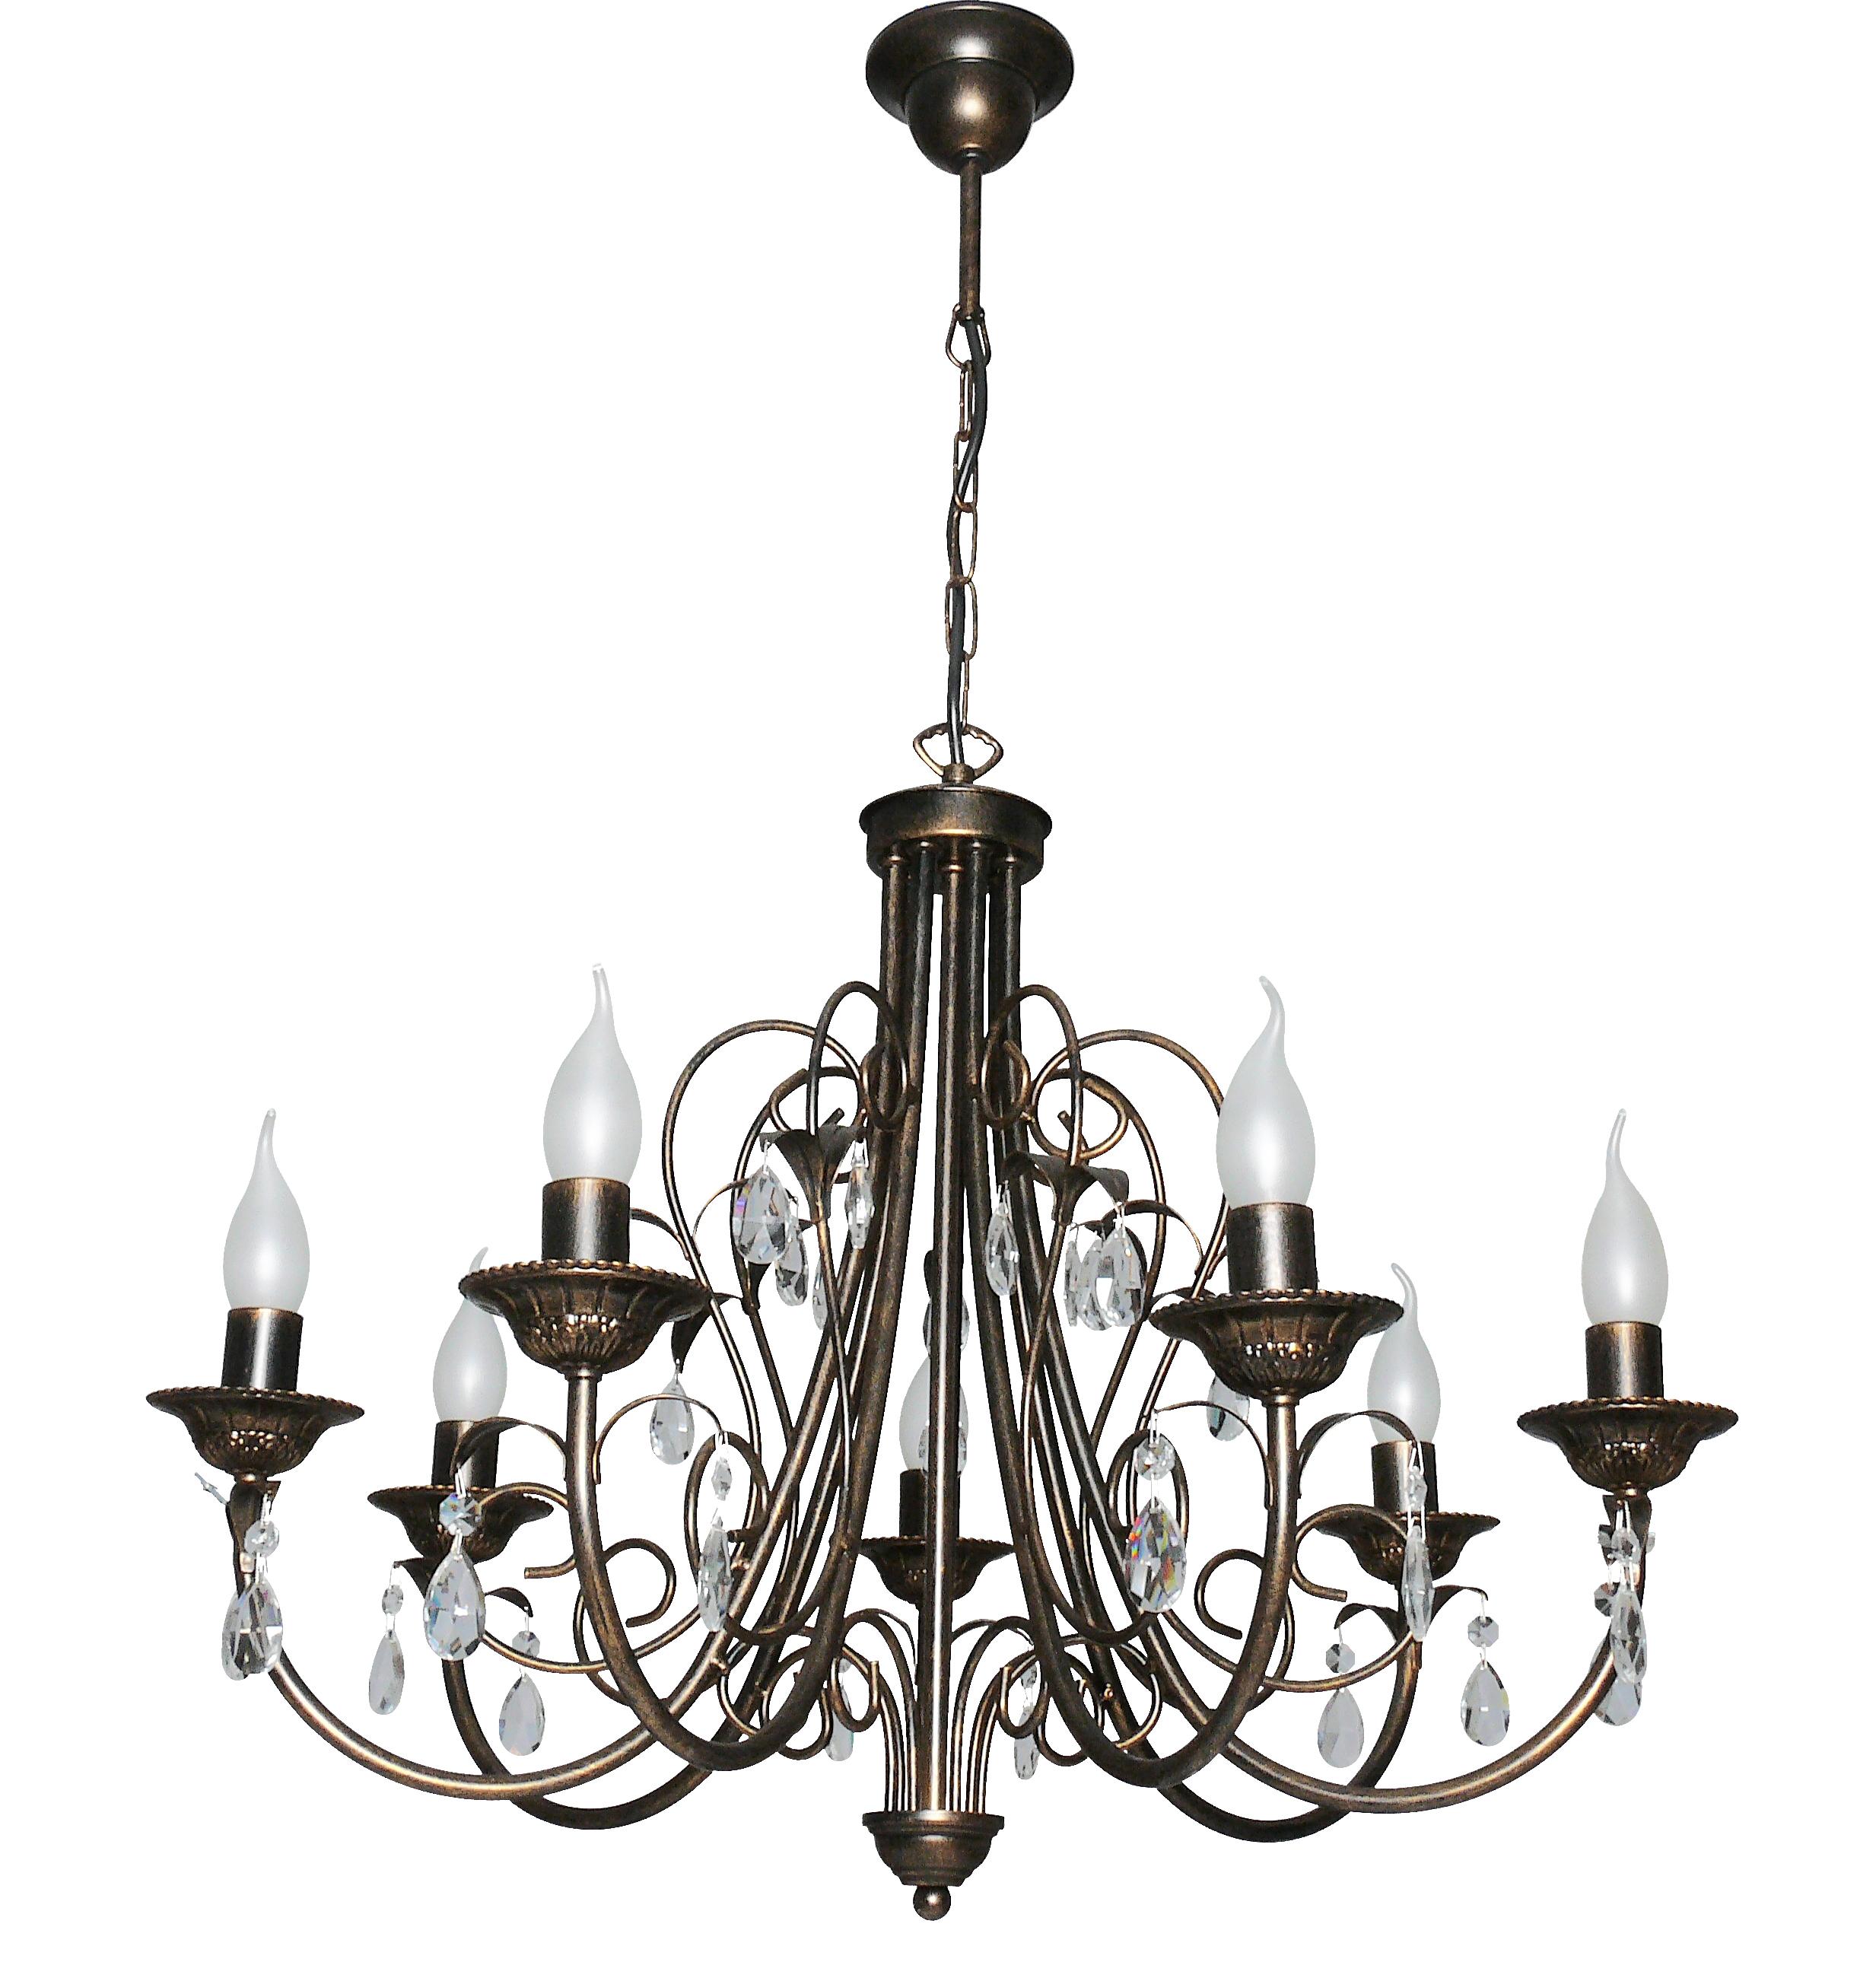 Люстра АВРОРА Муссон 10003-7l люстра lamplandia daria 3х40вт е14 металл темно коричневый